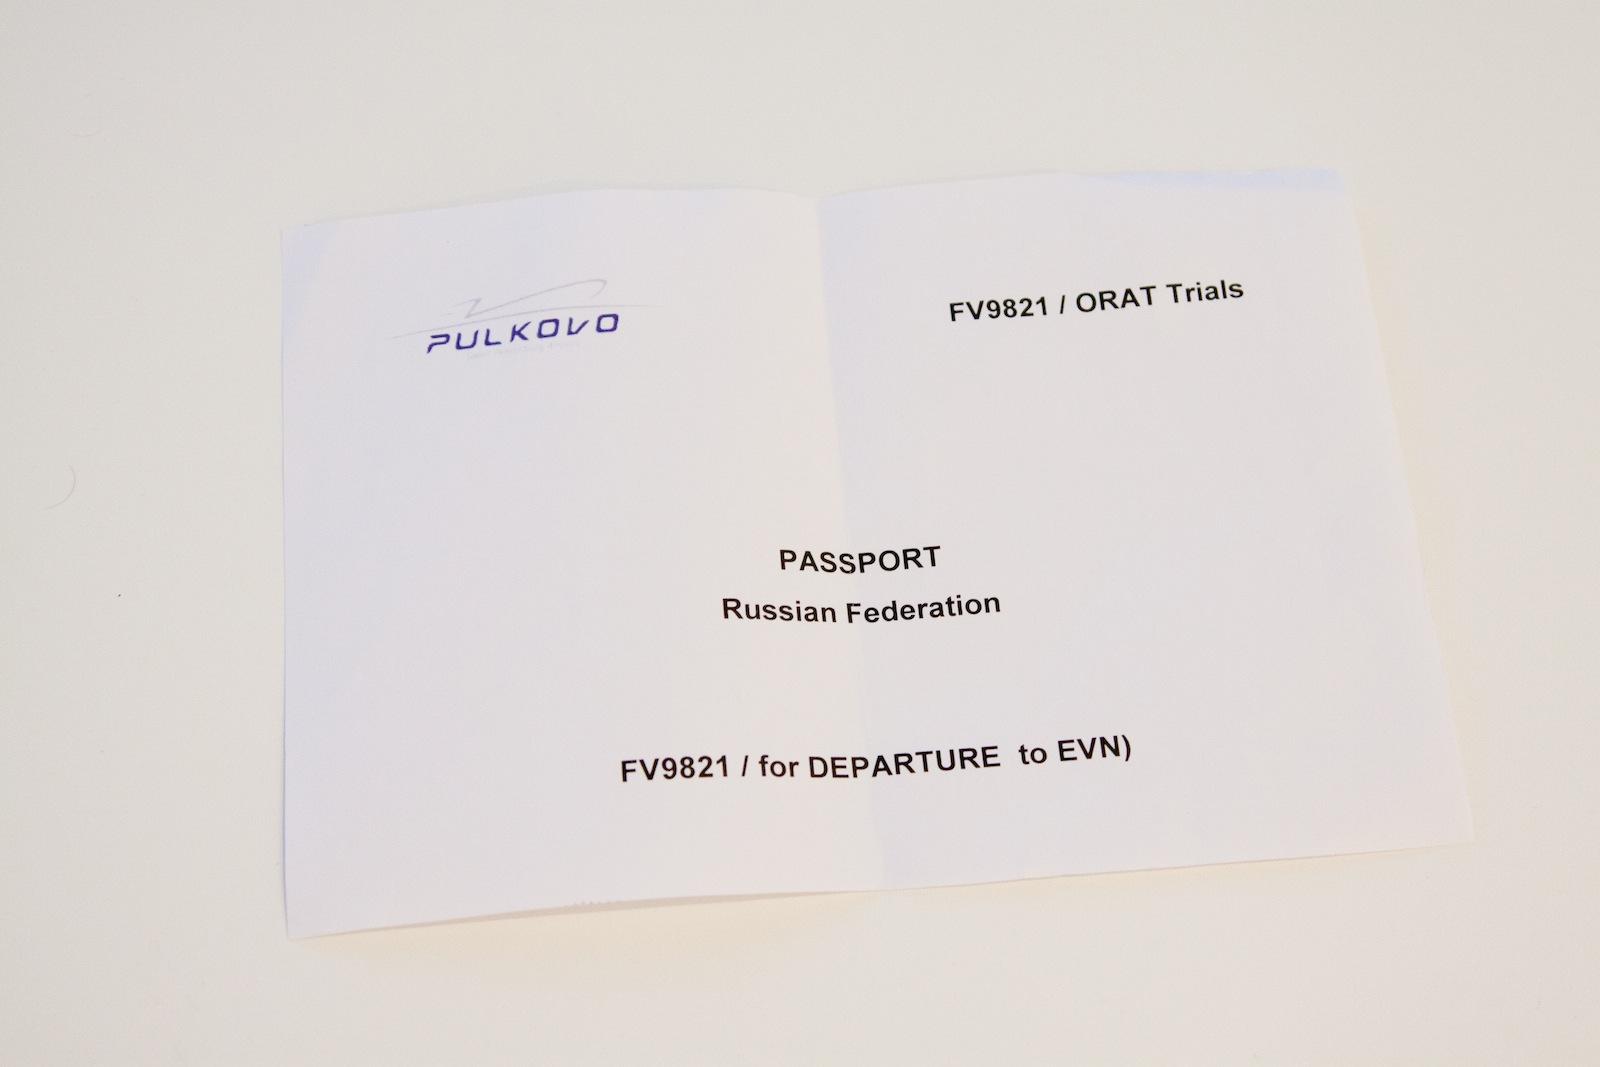 Тестовый паспорт тестового пассажира